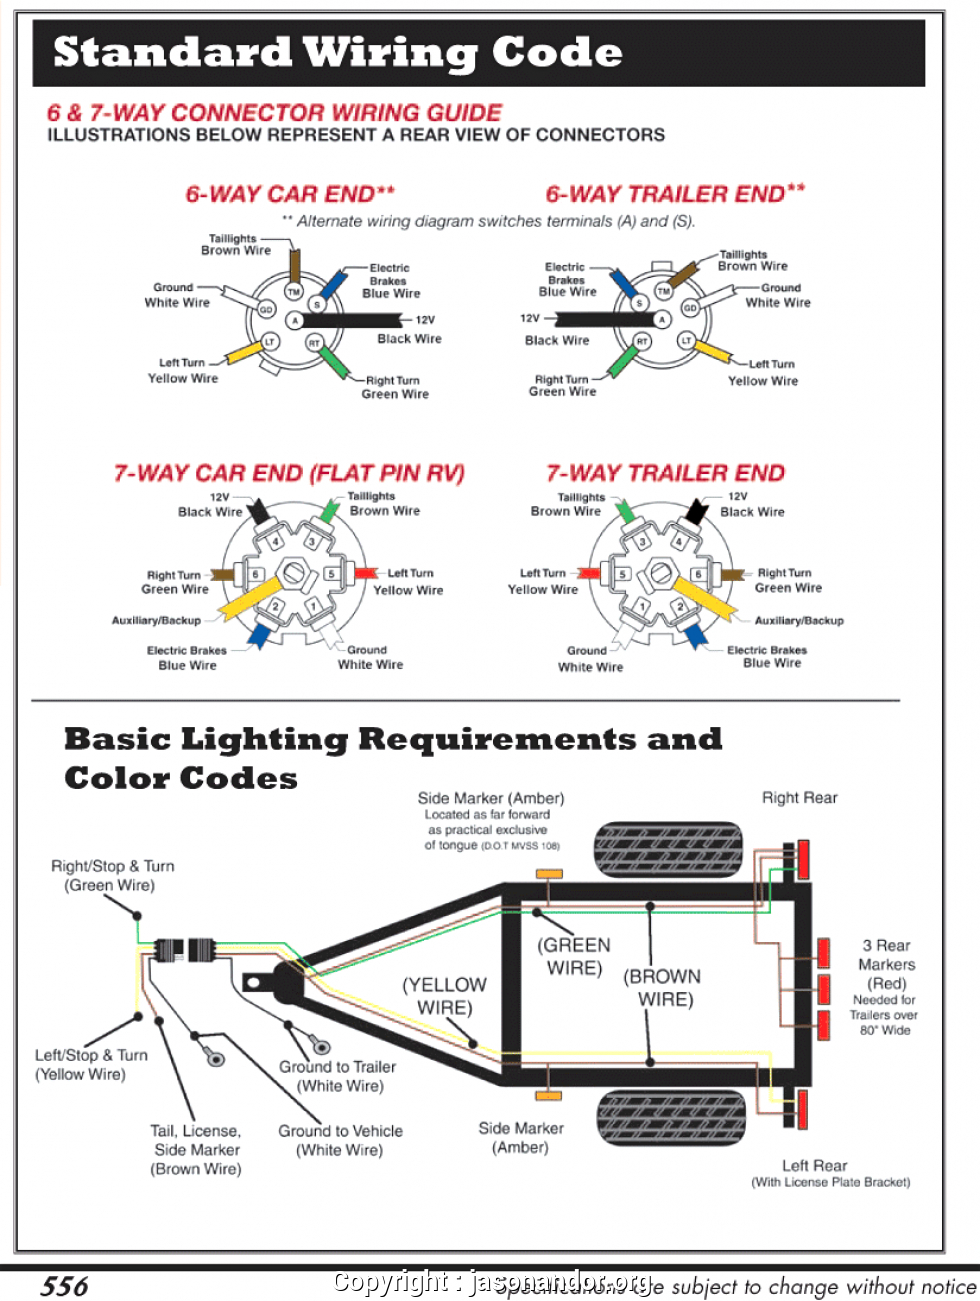 Rg 7017 Procraft Wiring Diagram Free Diagram